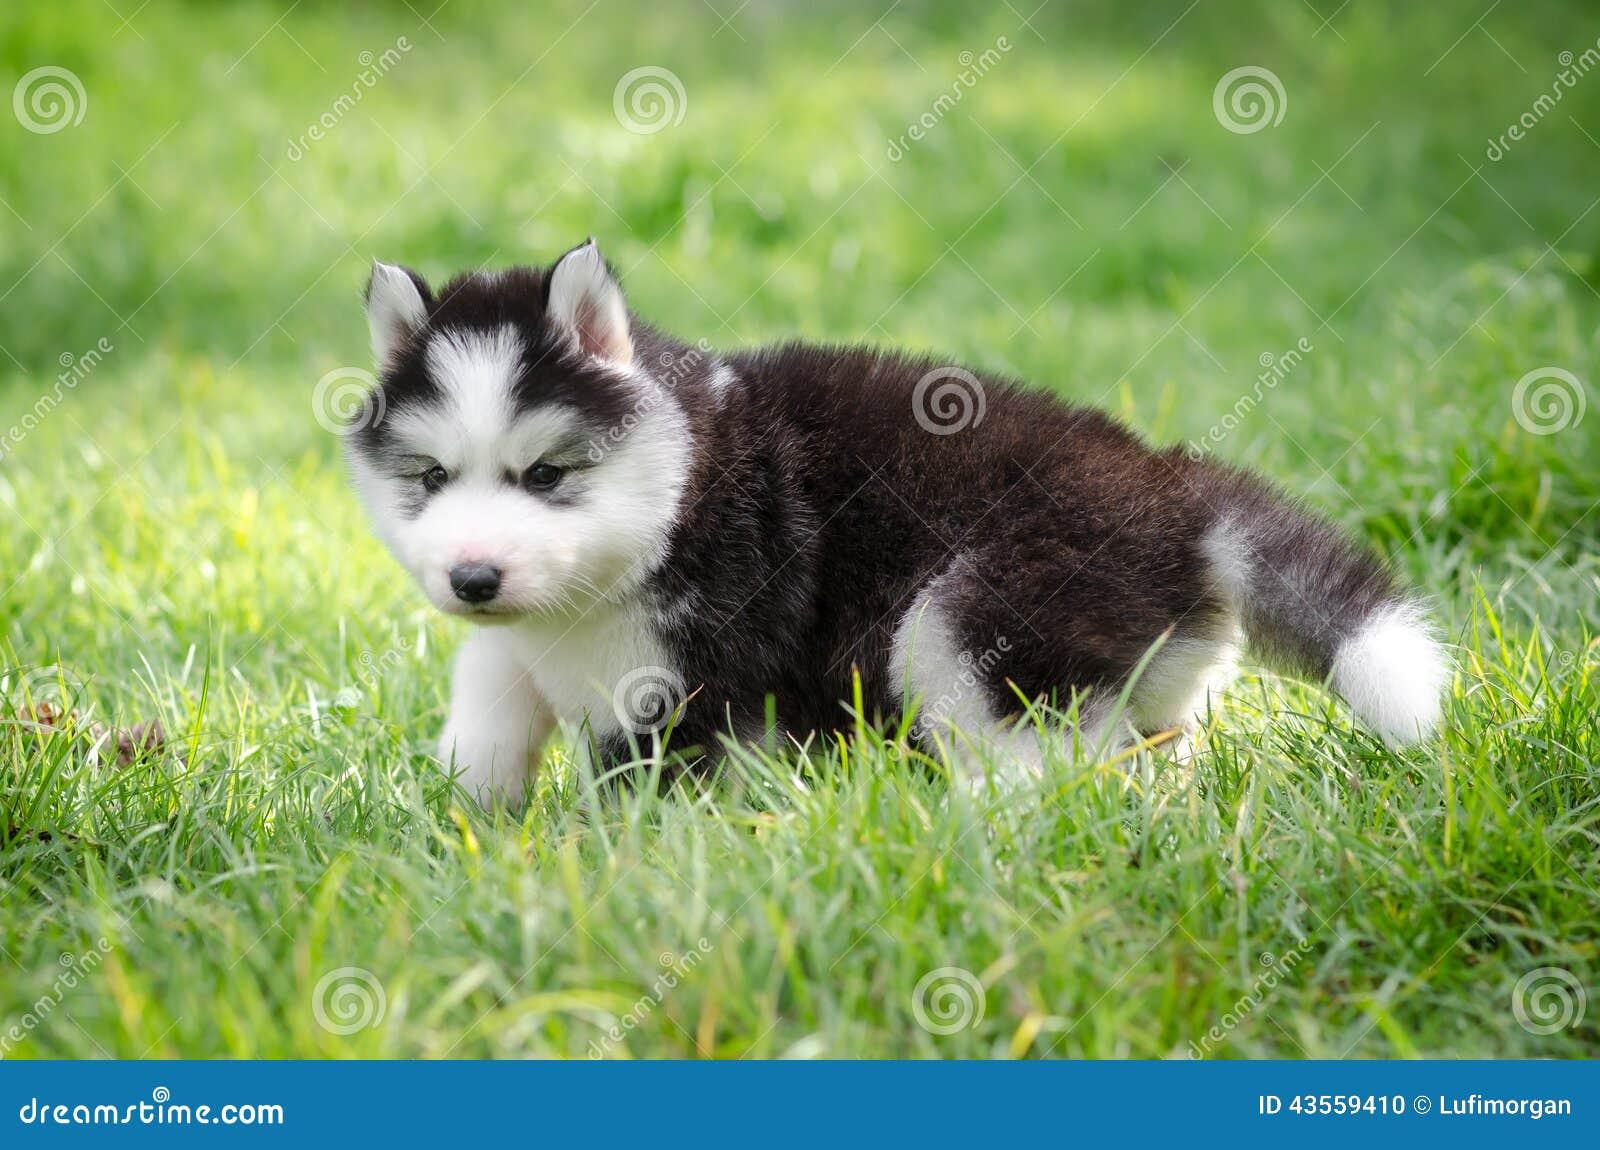 Puppy Siberian Husky On Grass Stock Photo Image Of Gray Land